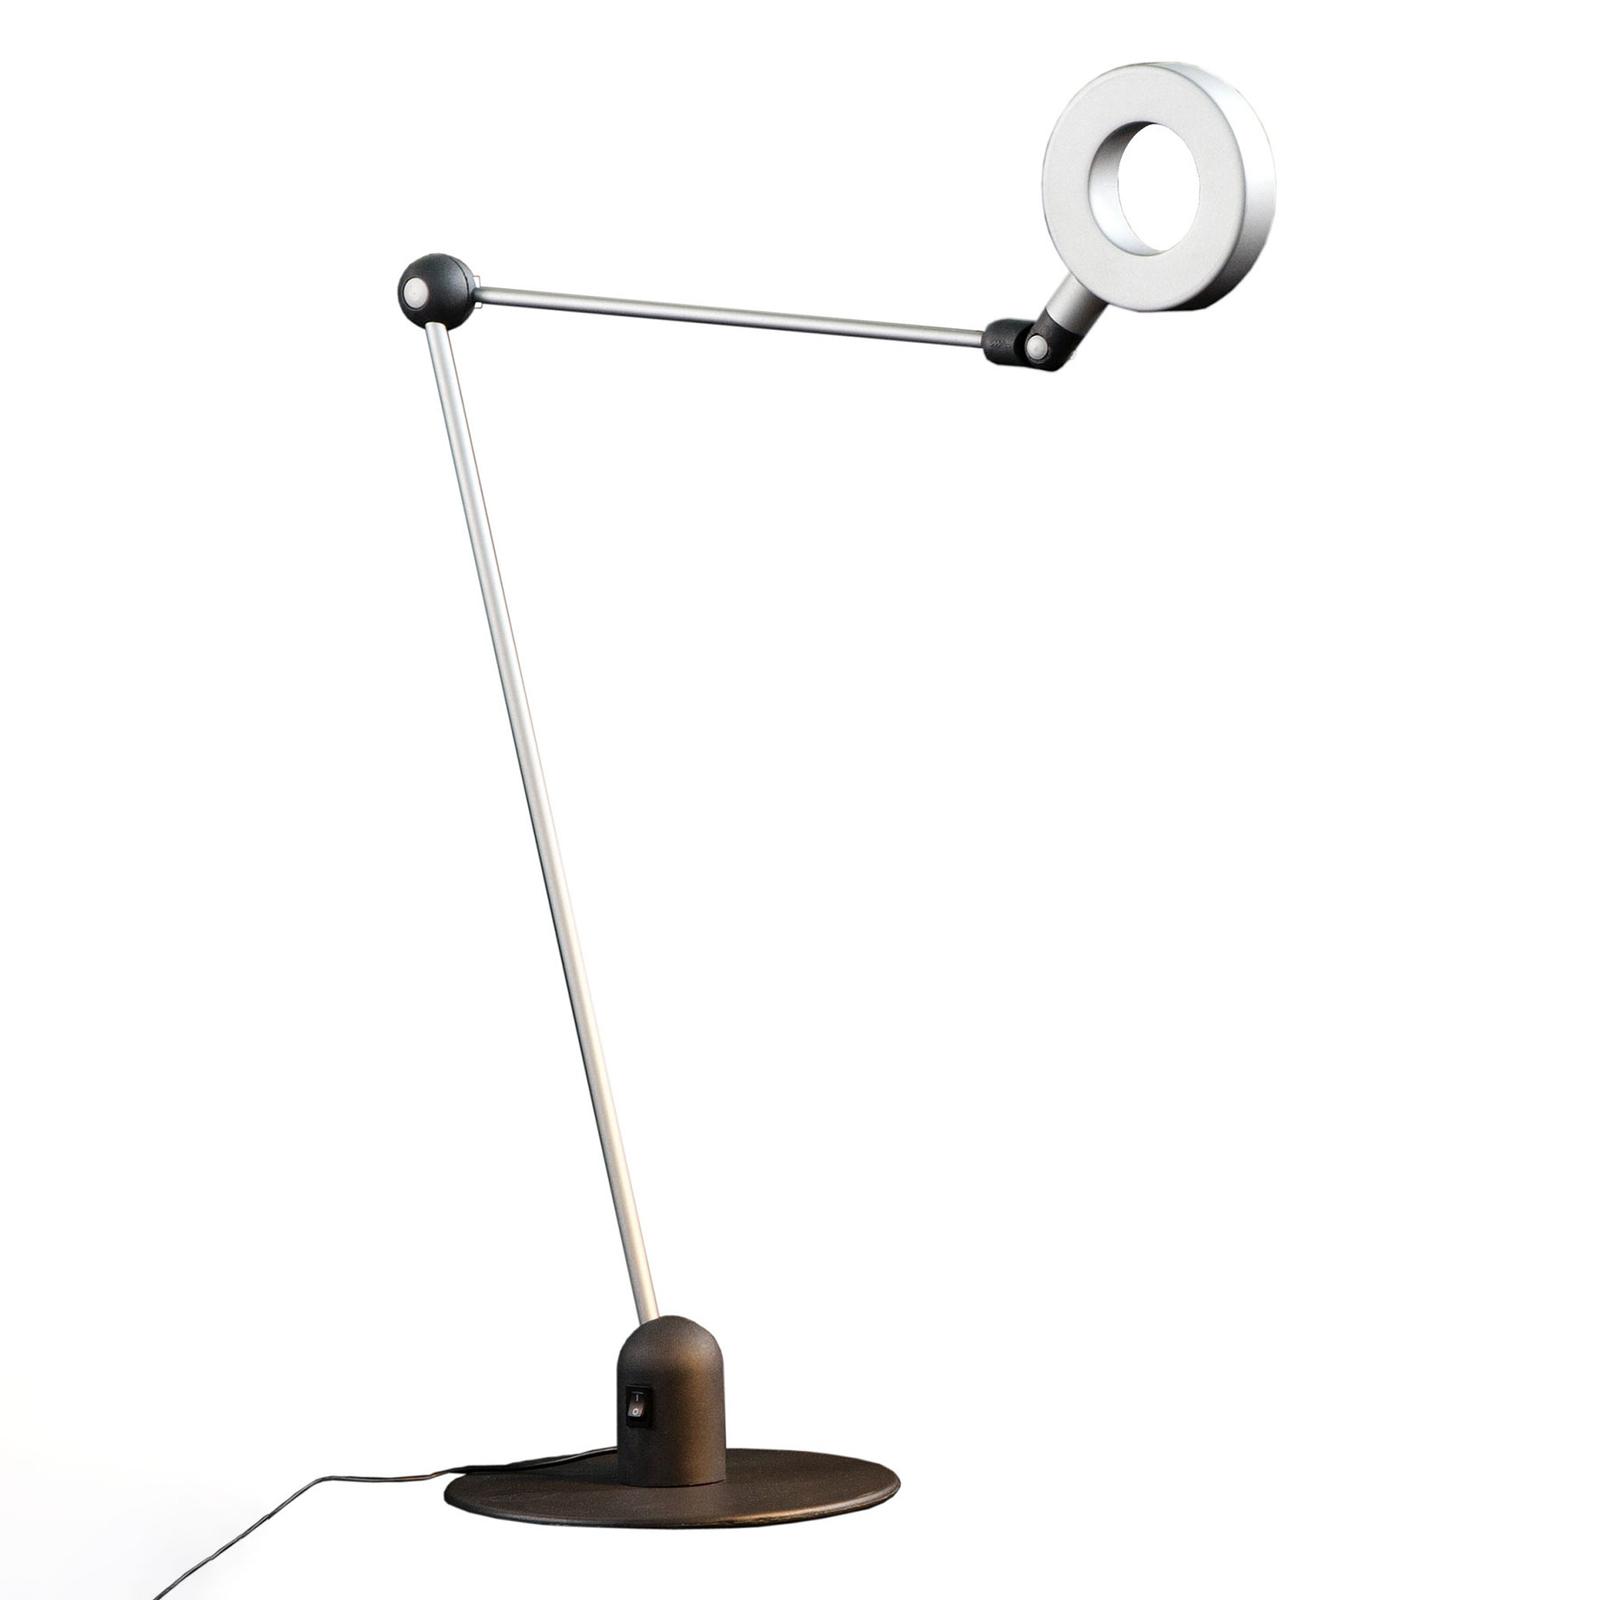 Martinelli Luce L'amica LED-bordslampa, grå